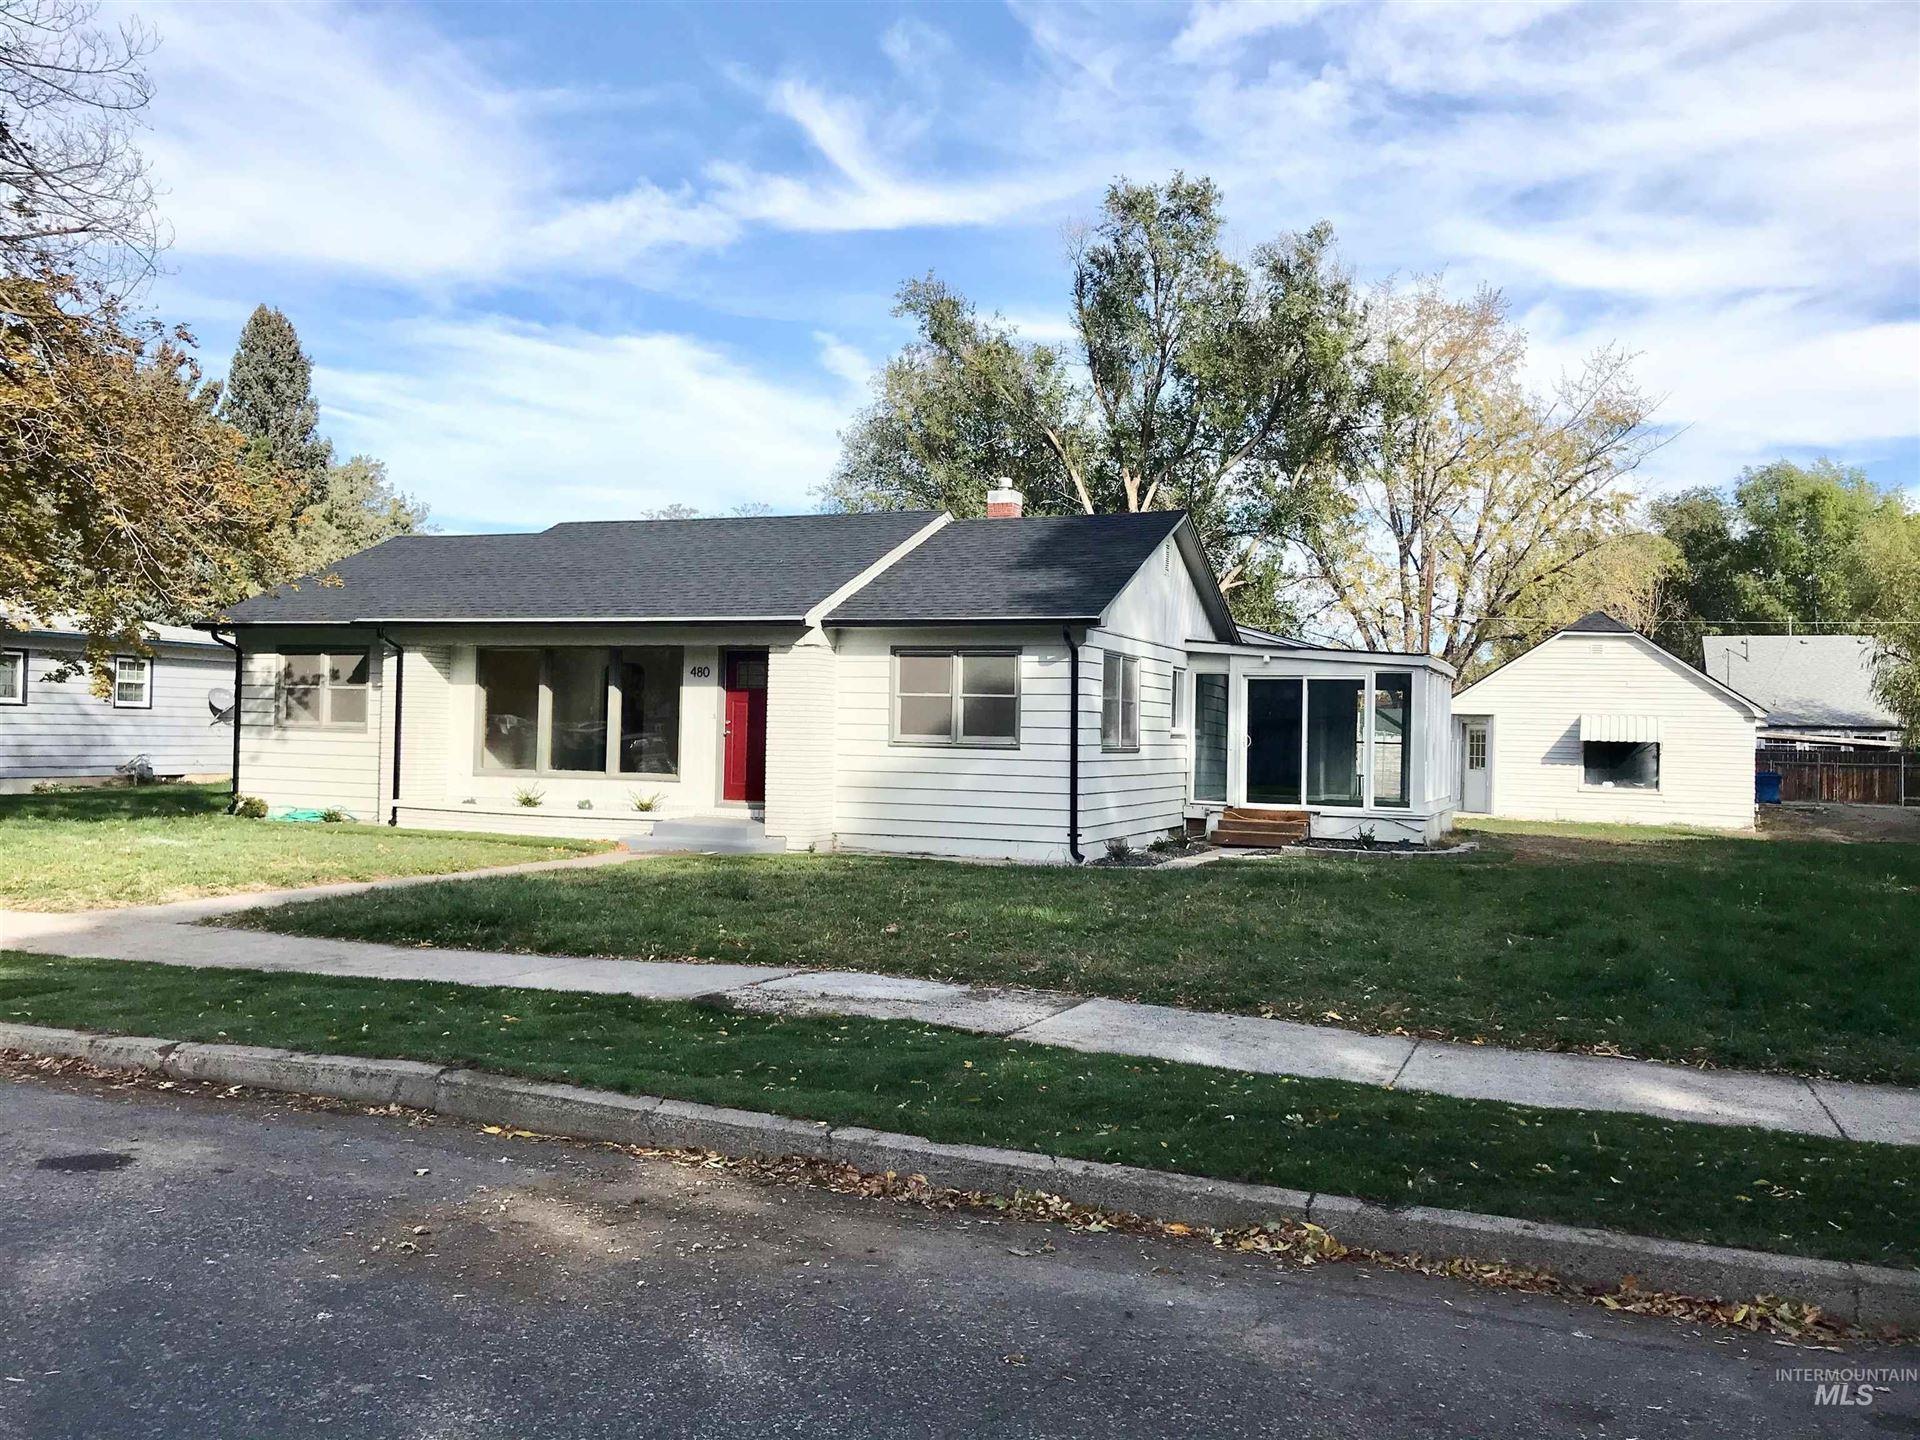 Photo of 480 N 8th East, Mountain Home, ID 83647 (MLS # 98822955)